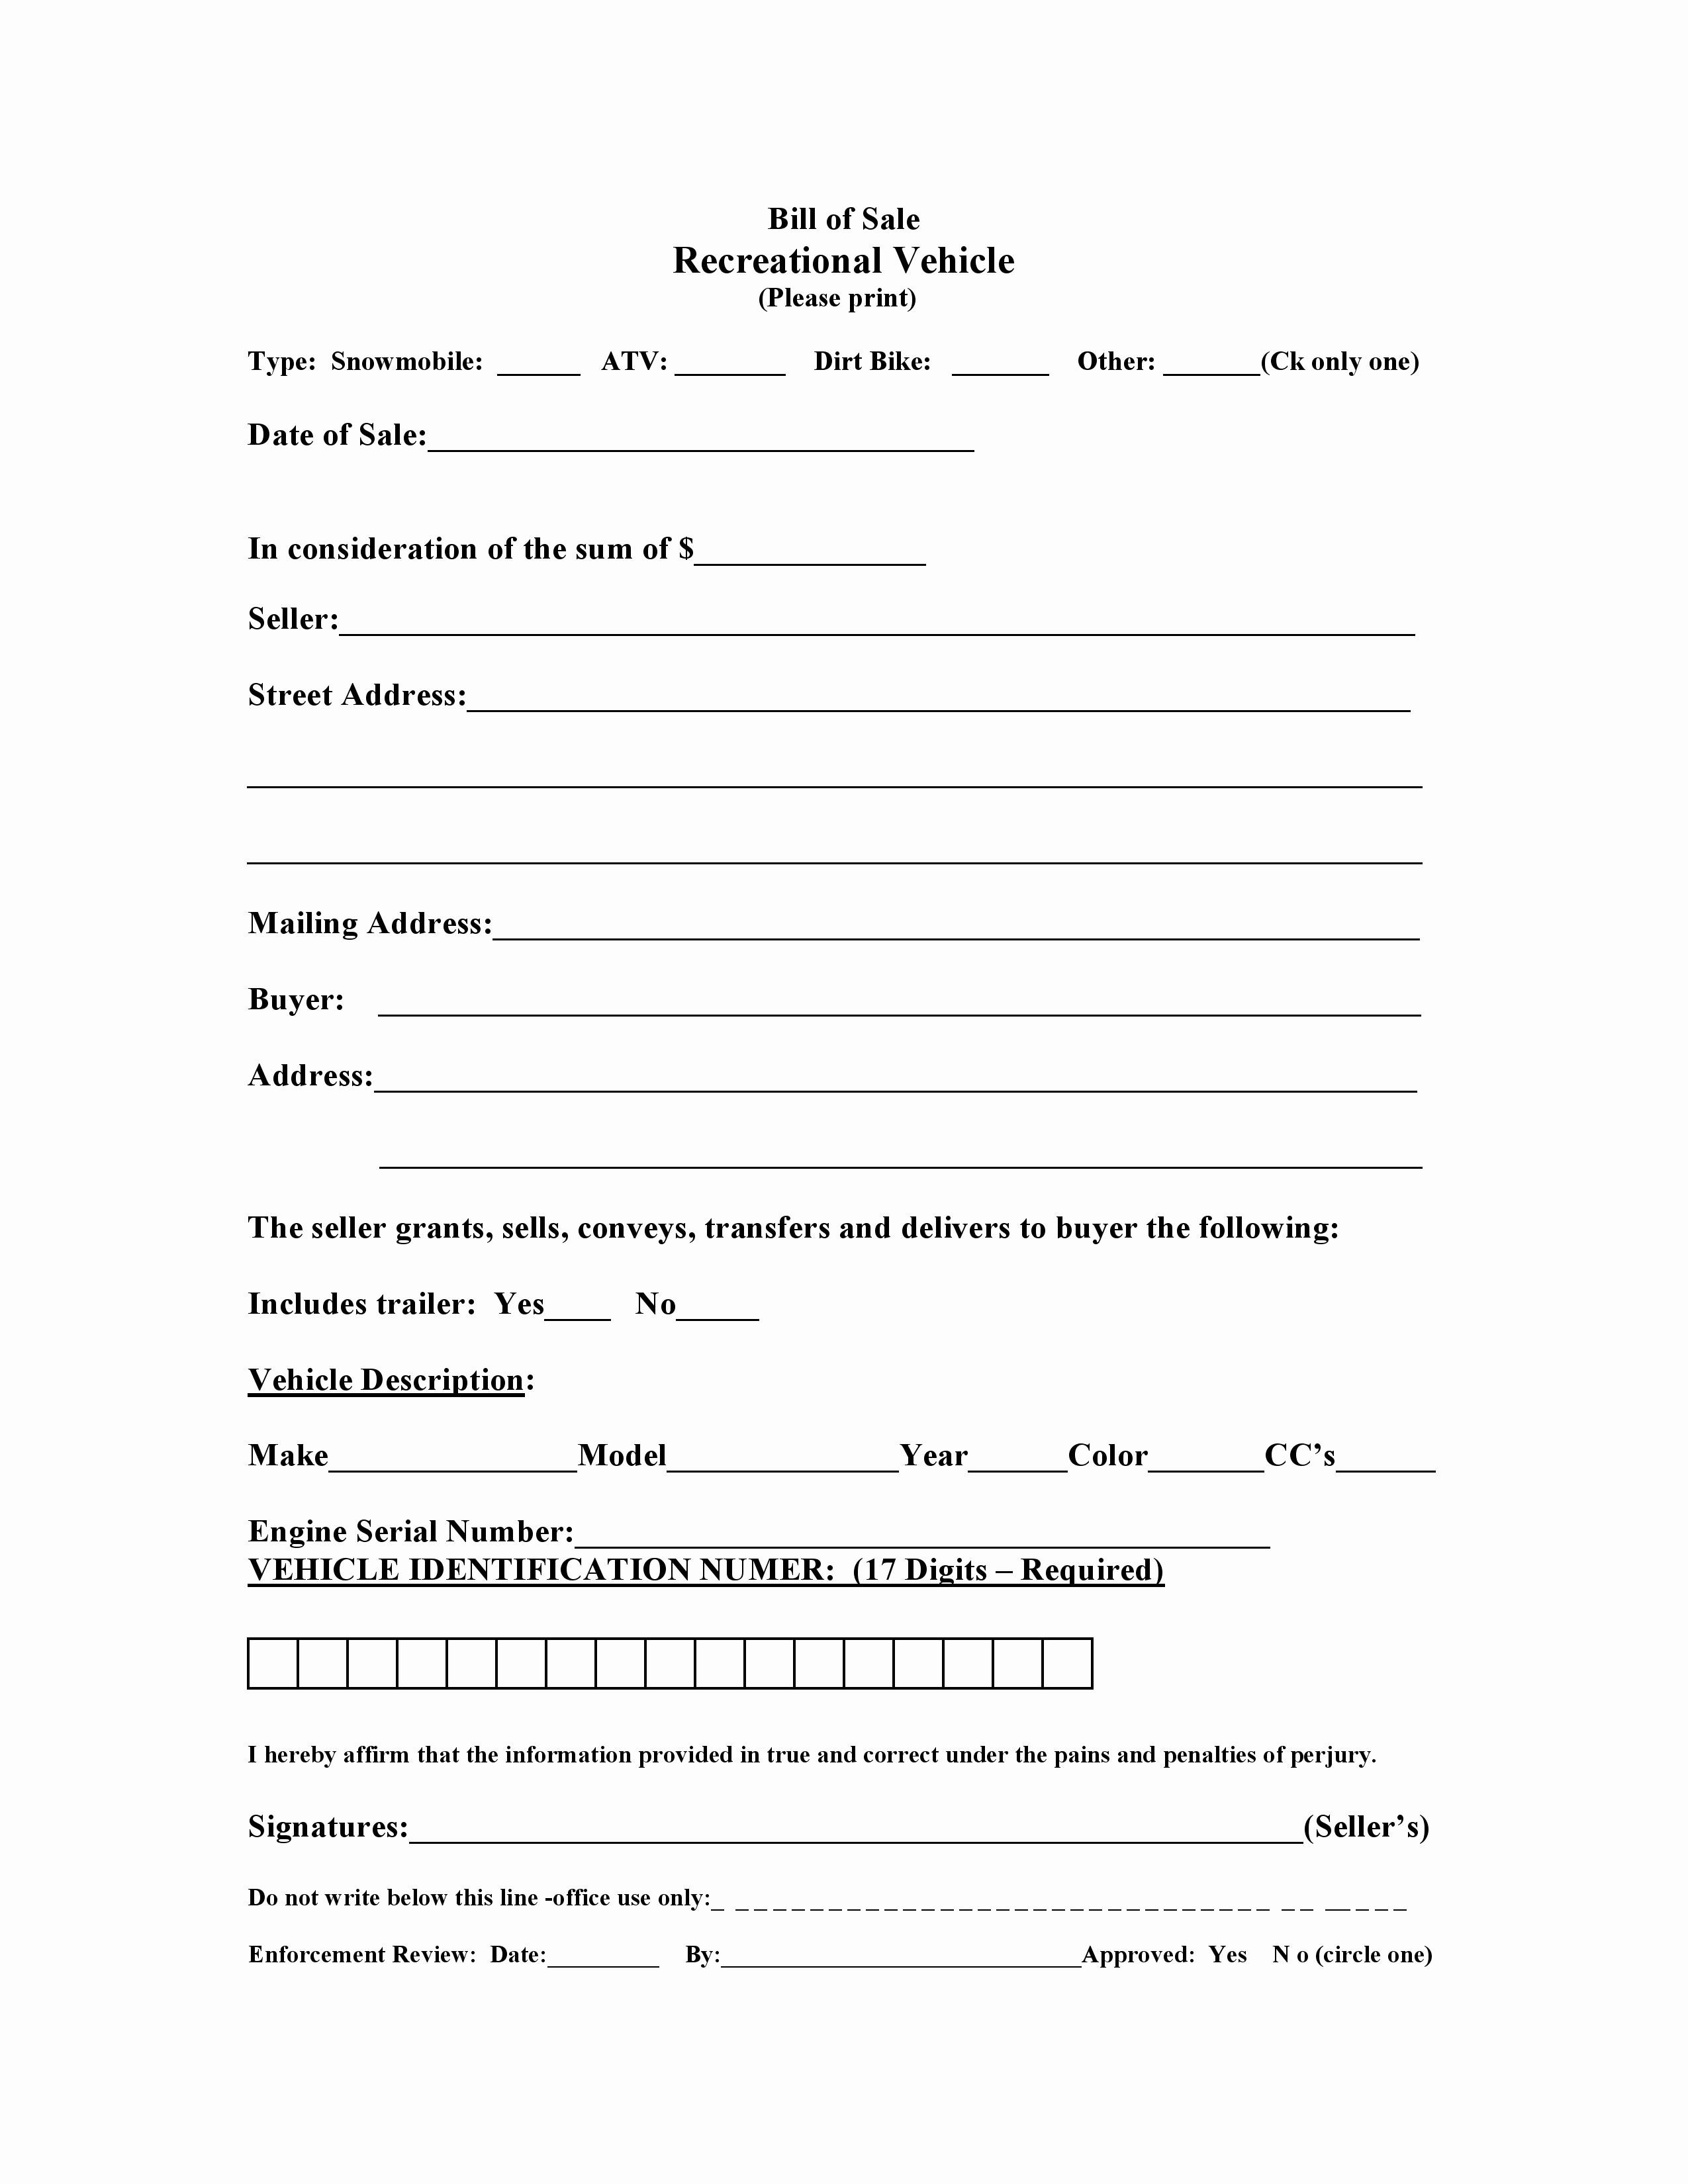 Bill Of Sale Auto Florida Unique Free Massachusetts Recreational Vessel Vehicle Bill Of